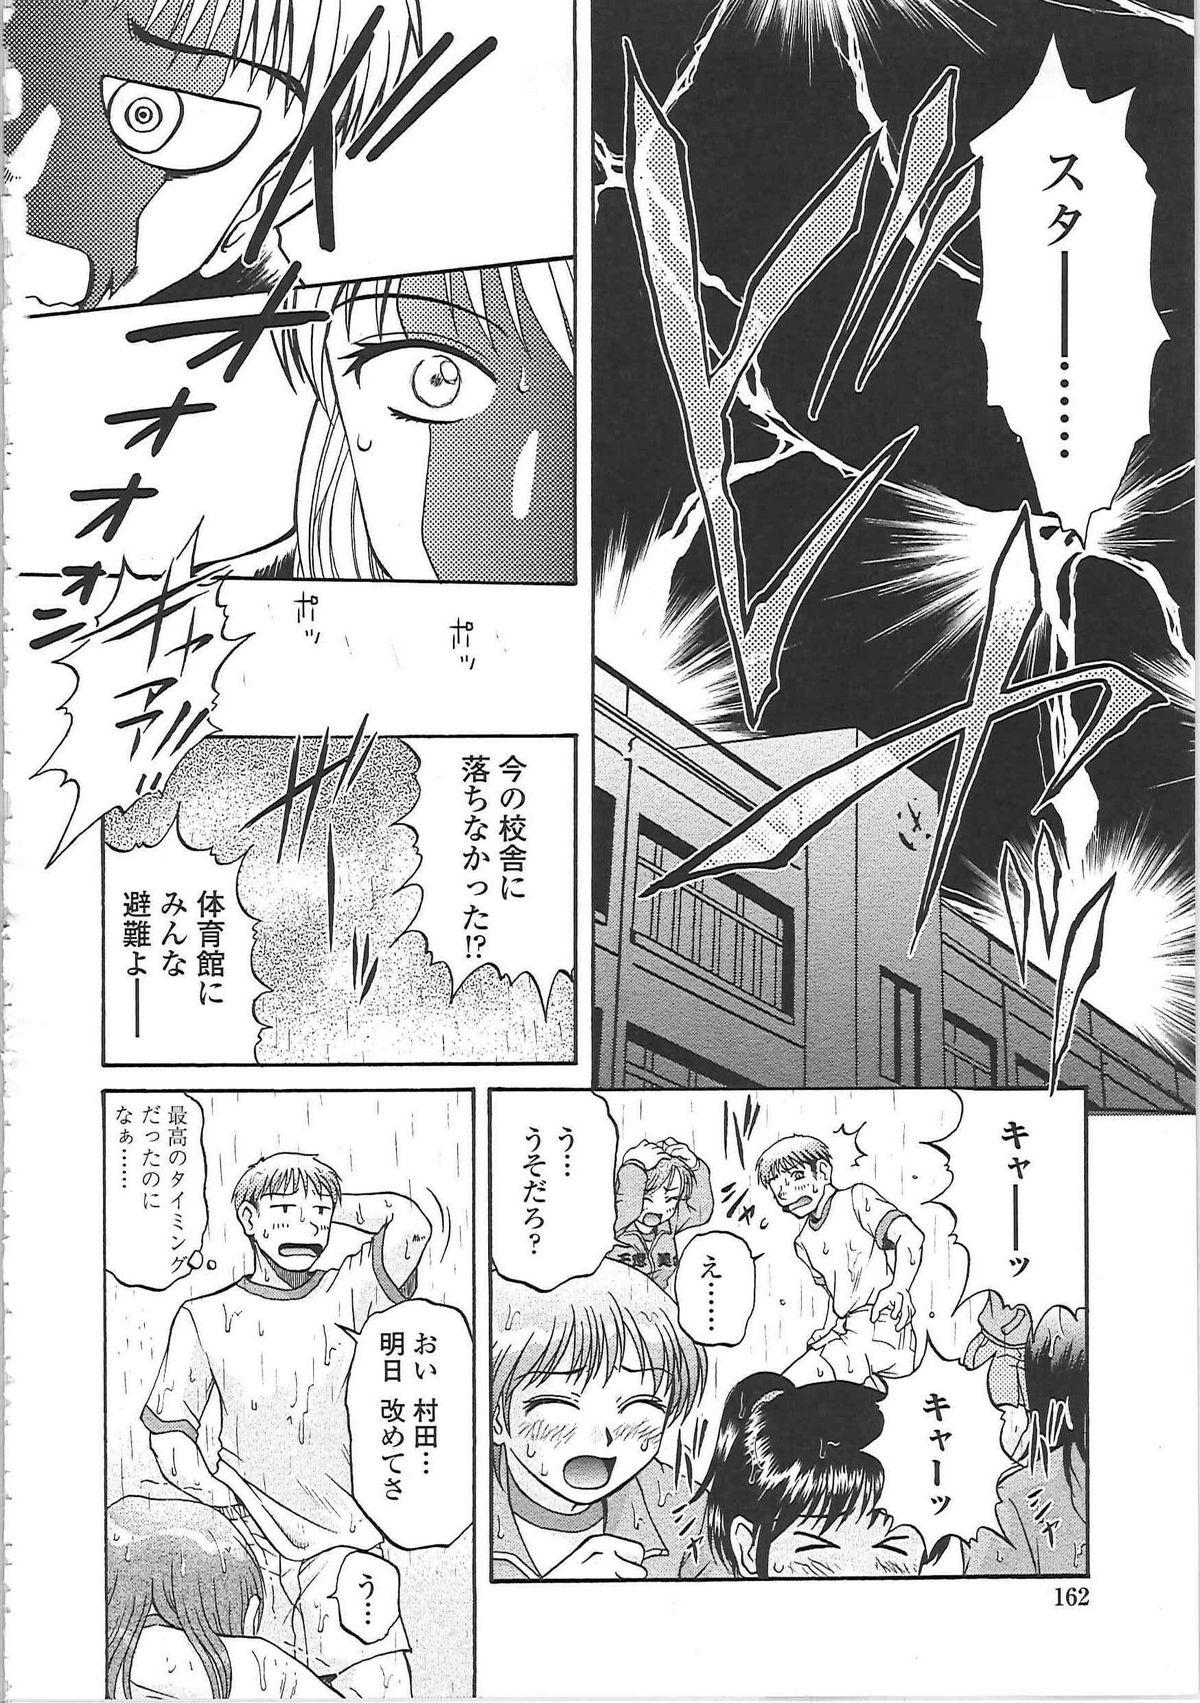 Nikuzuma Tsuushin - Erotic Wife Communication 166